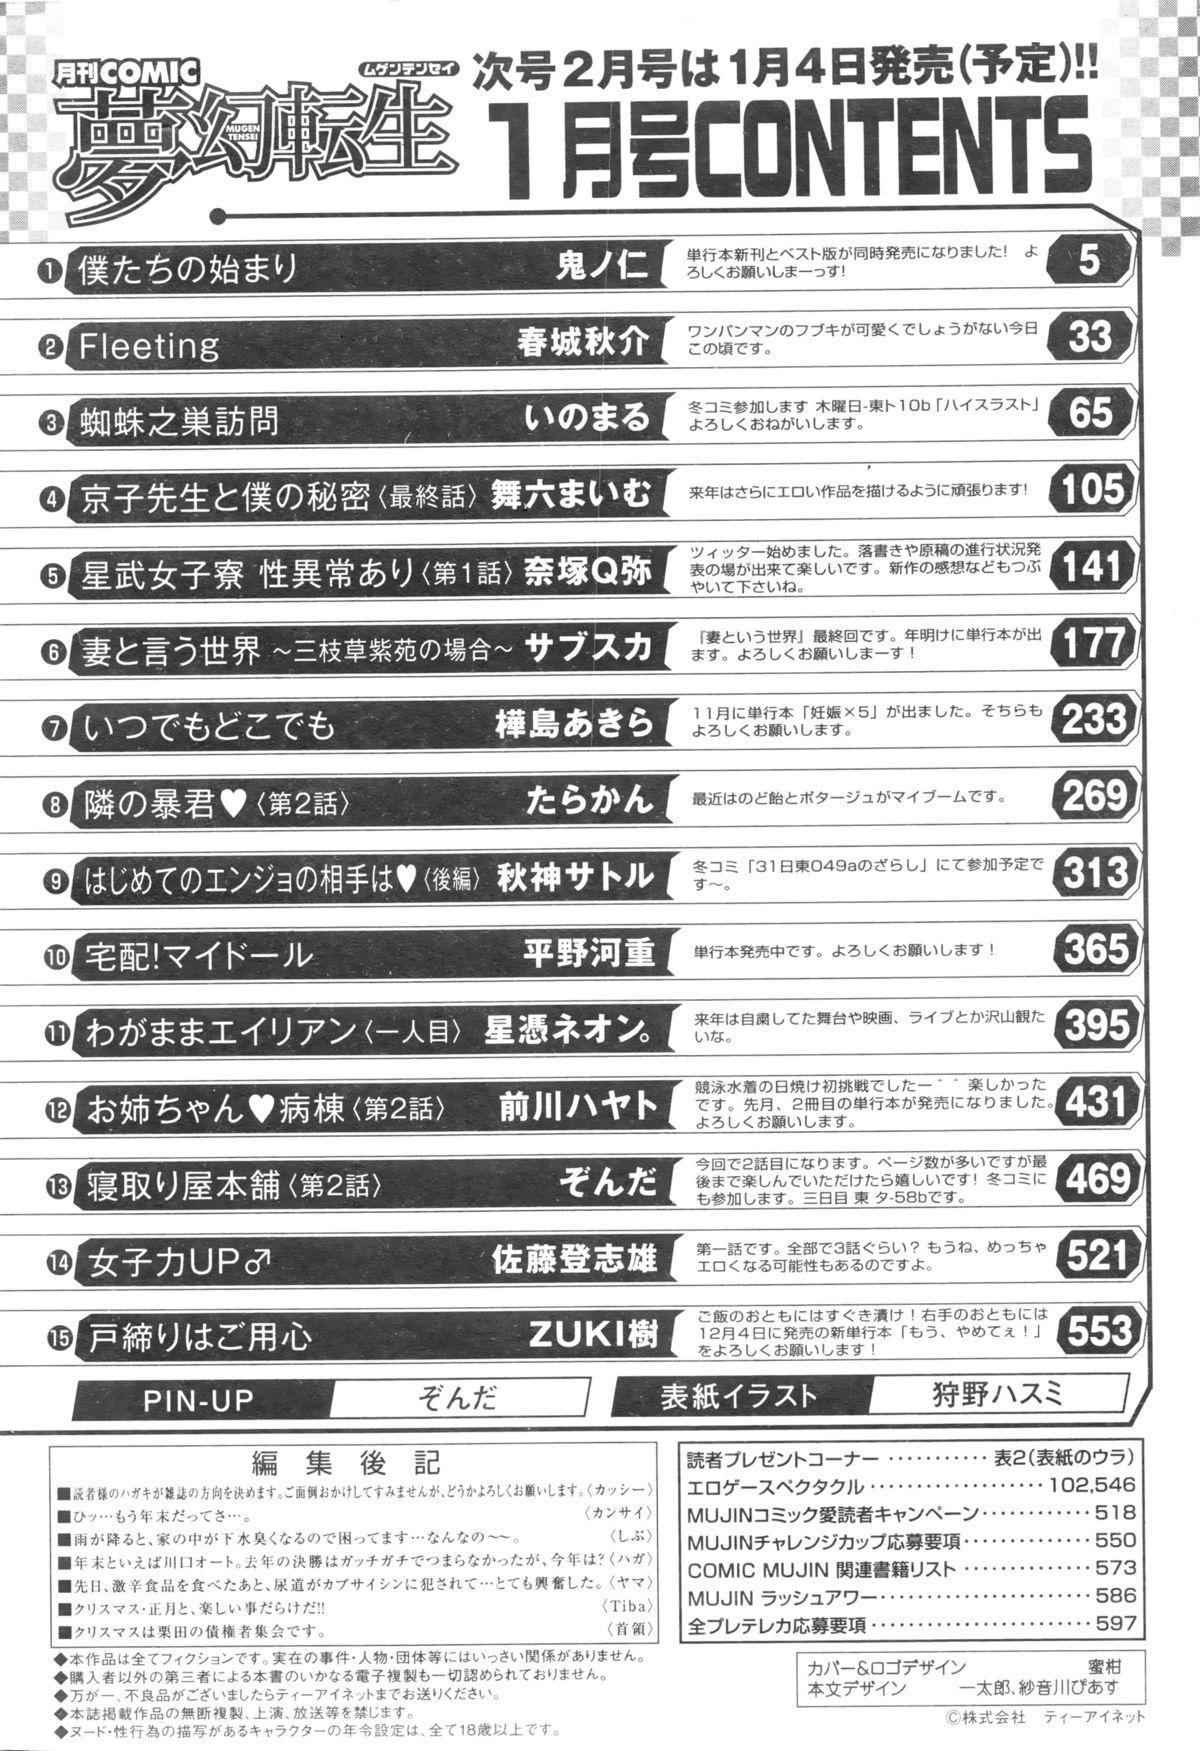 COMIC Mugen Tensei 2016-01 597